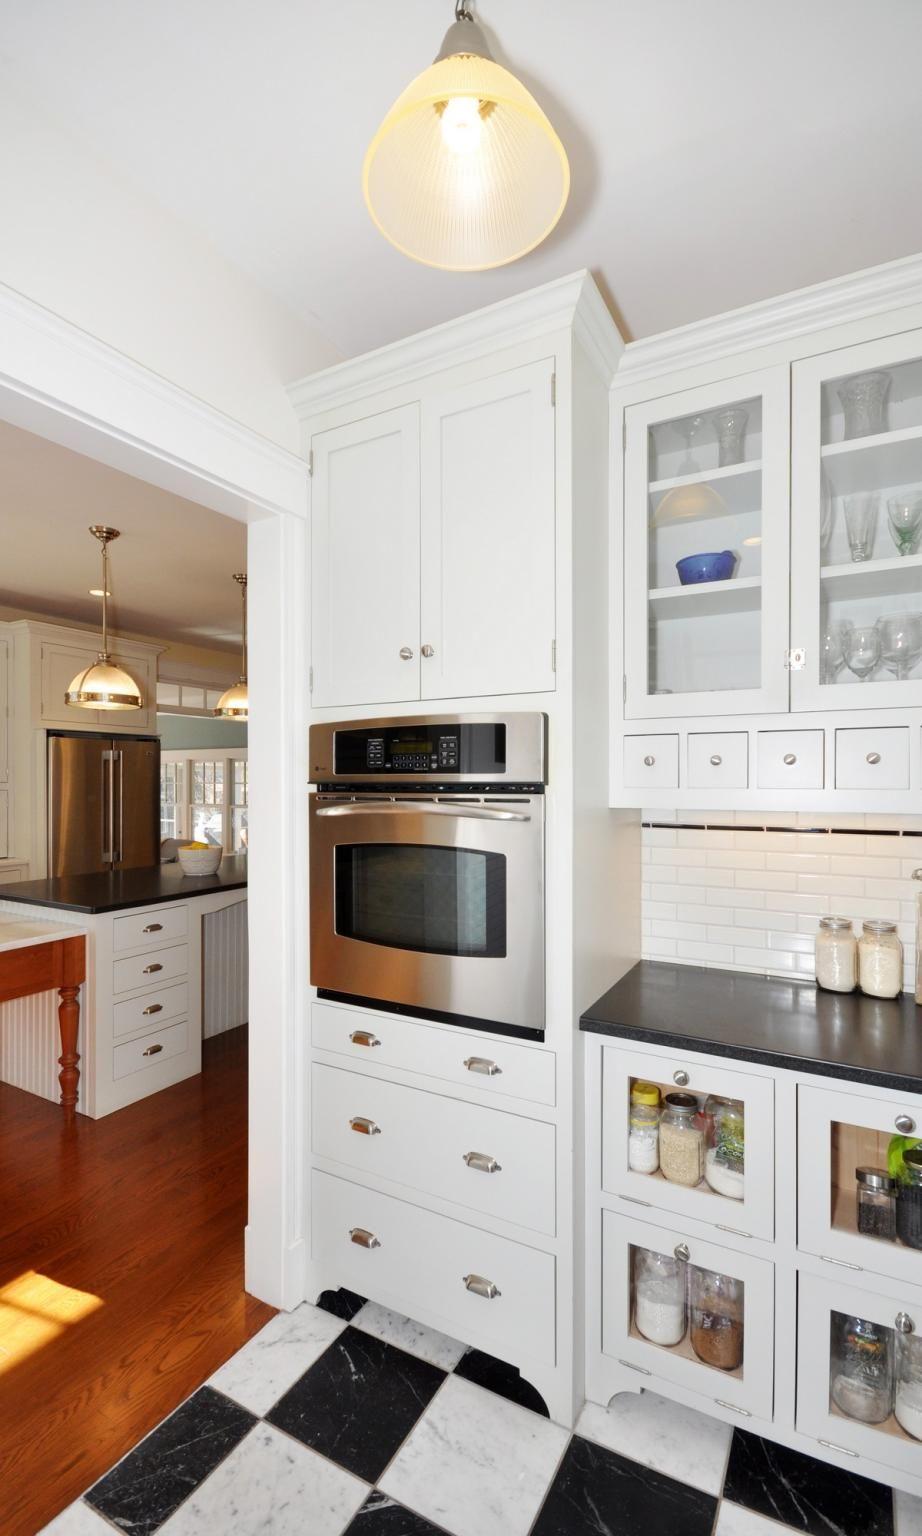 159 Everett Street Concord Ma Home Home And Family Home Decor